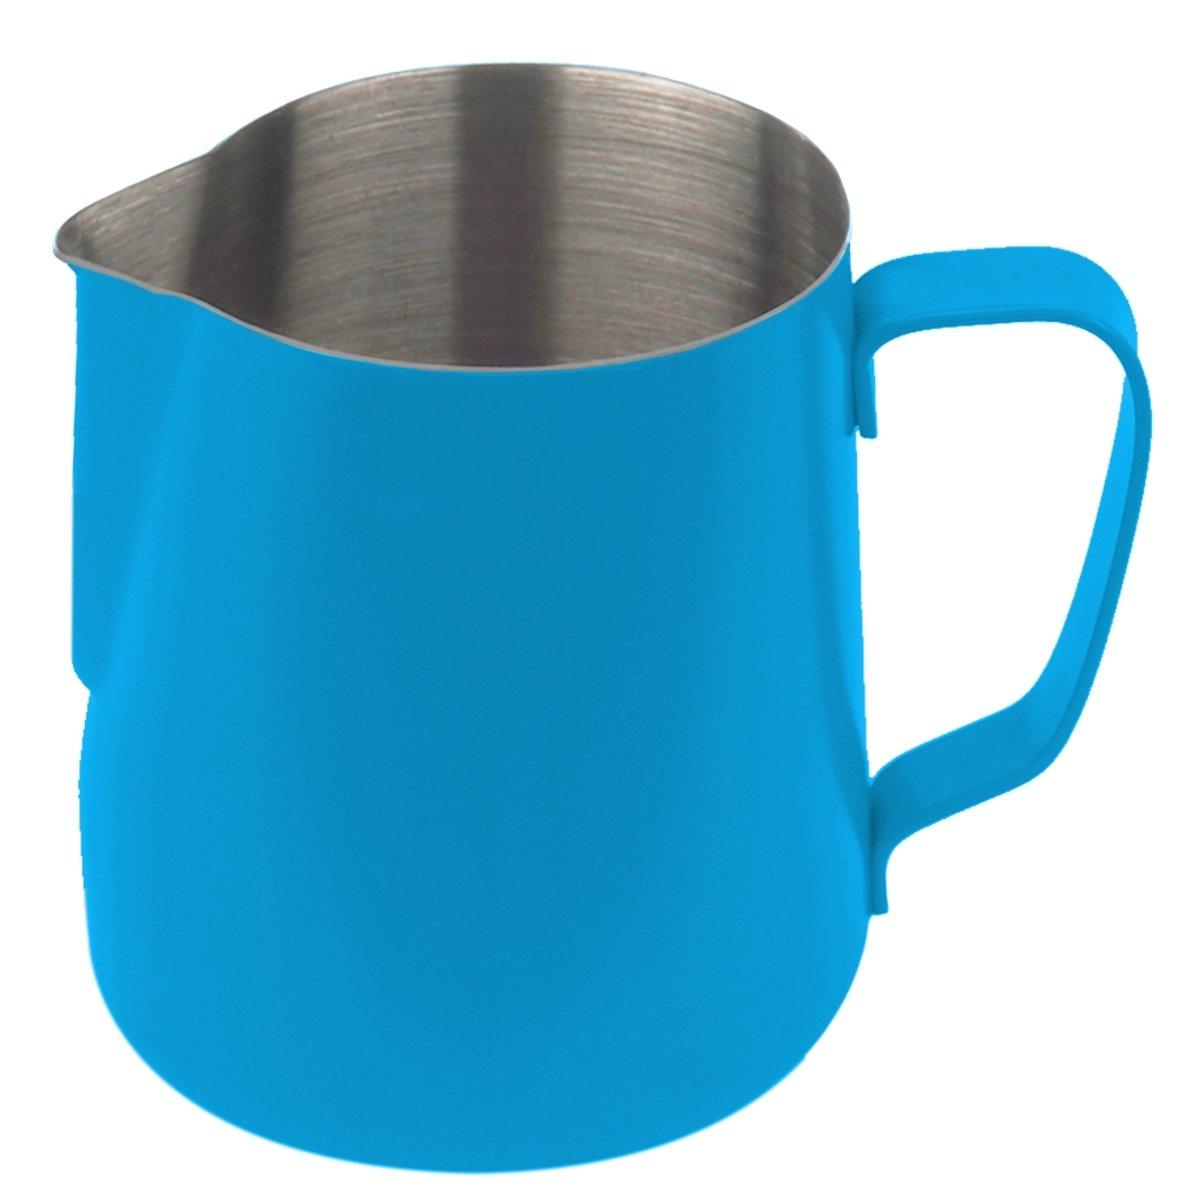 JoeFrex Melkkan Azuurblauw 590ml kopen